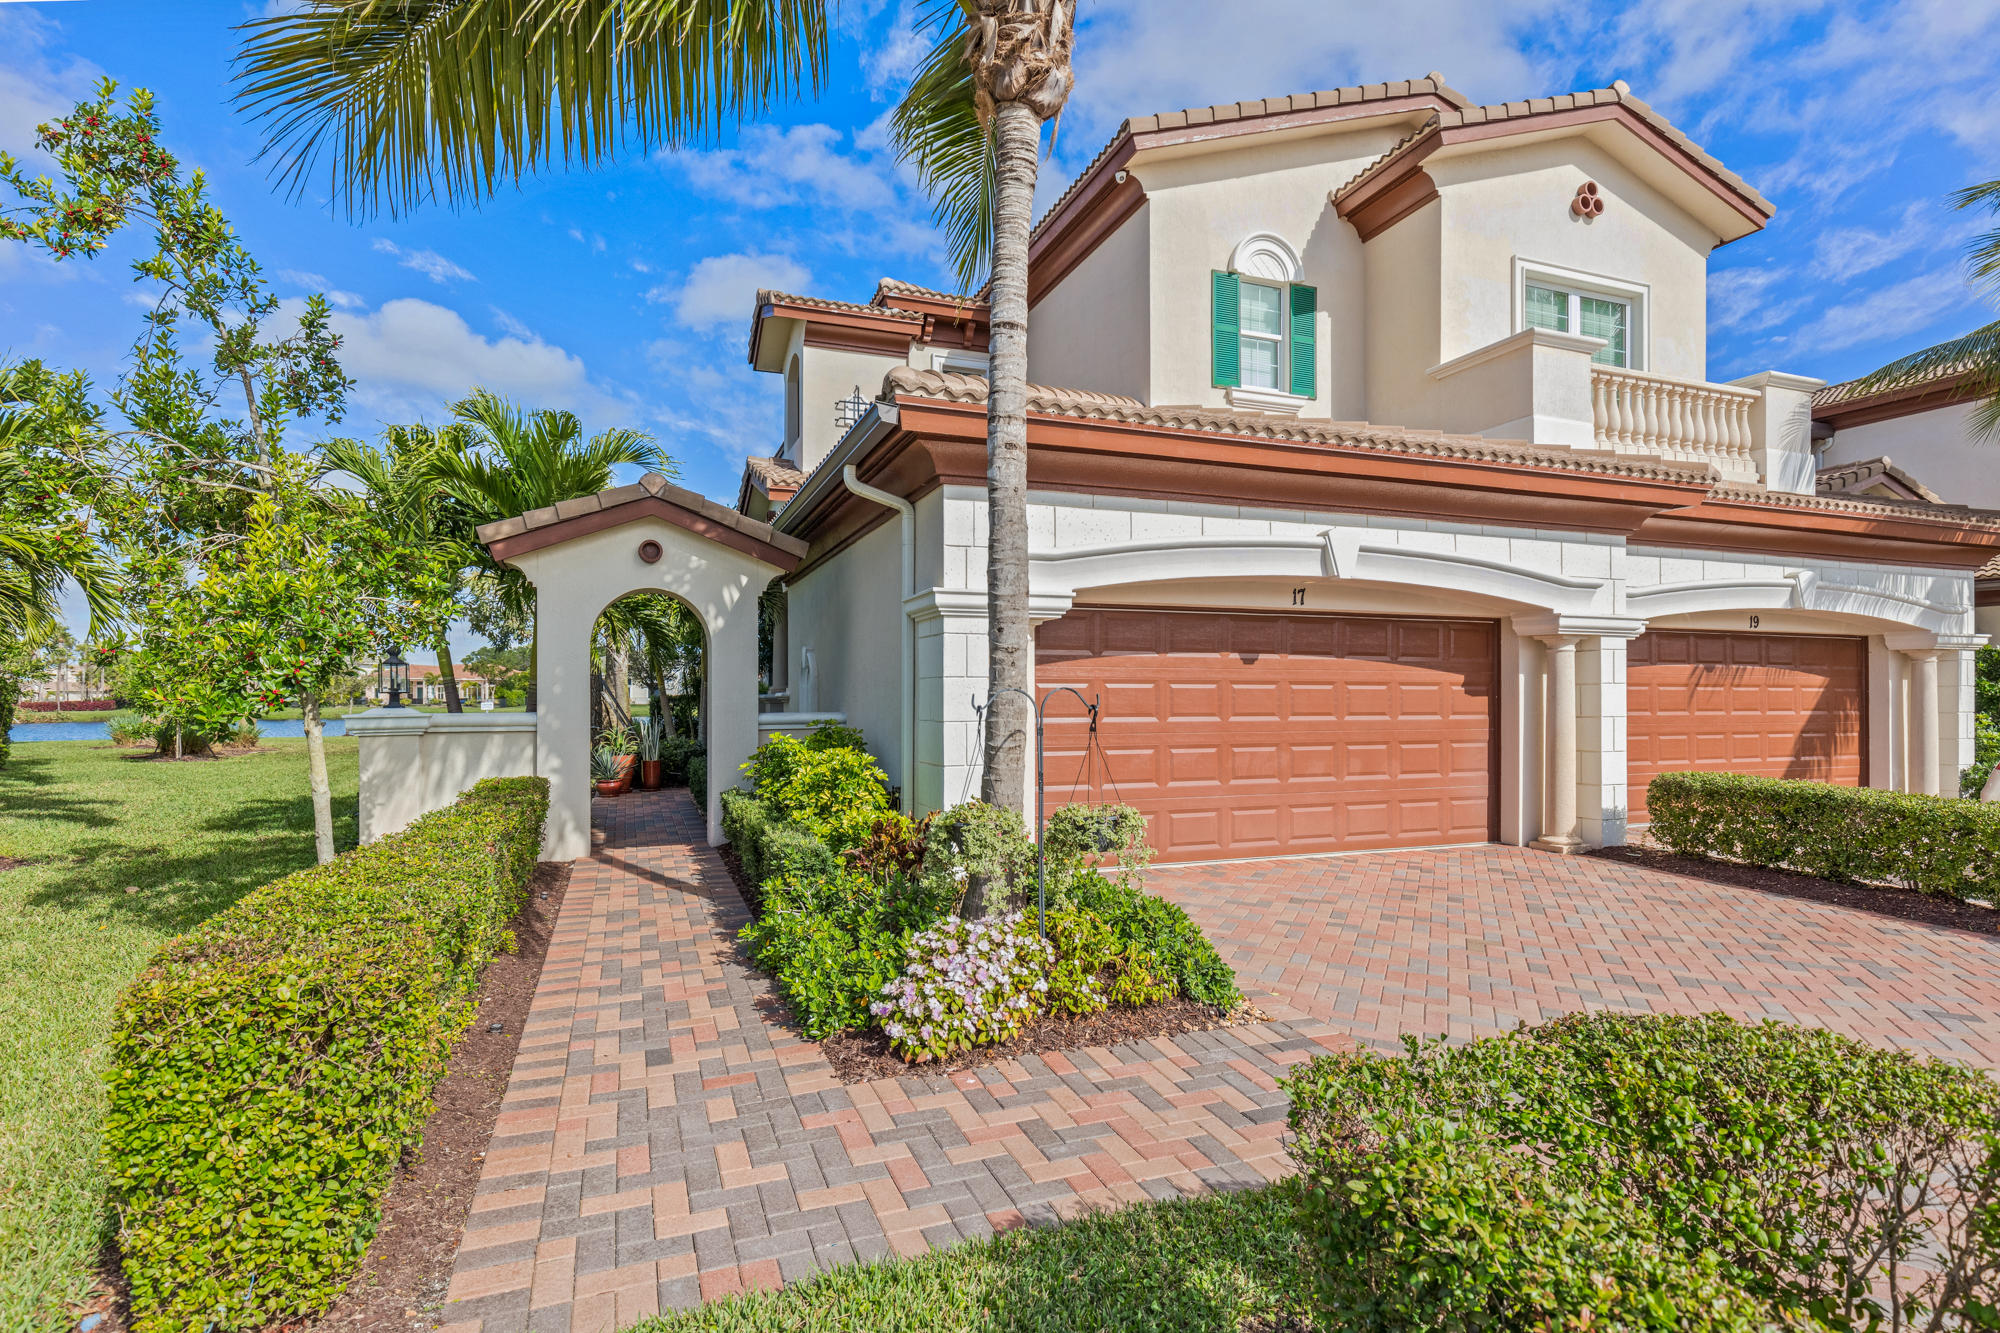 107 Tresana Boulevard 17, Jupiter, Florida 33478, 3 Bedrooms Bedrooms, ,3 BathroomsBathrooms,A,Condominium,Tresana,RX-10460956